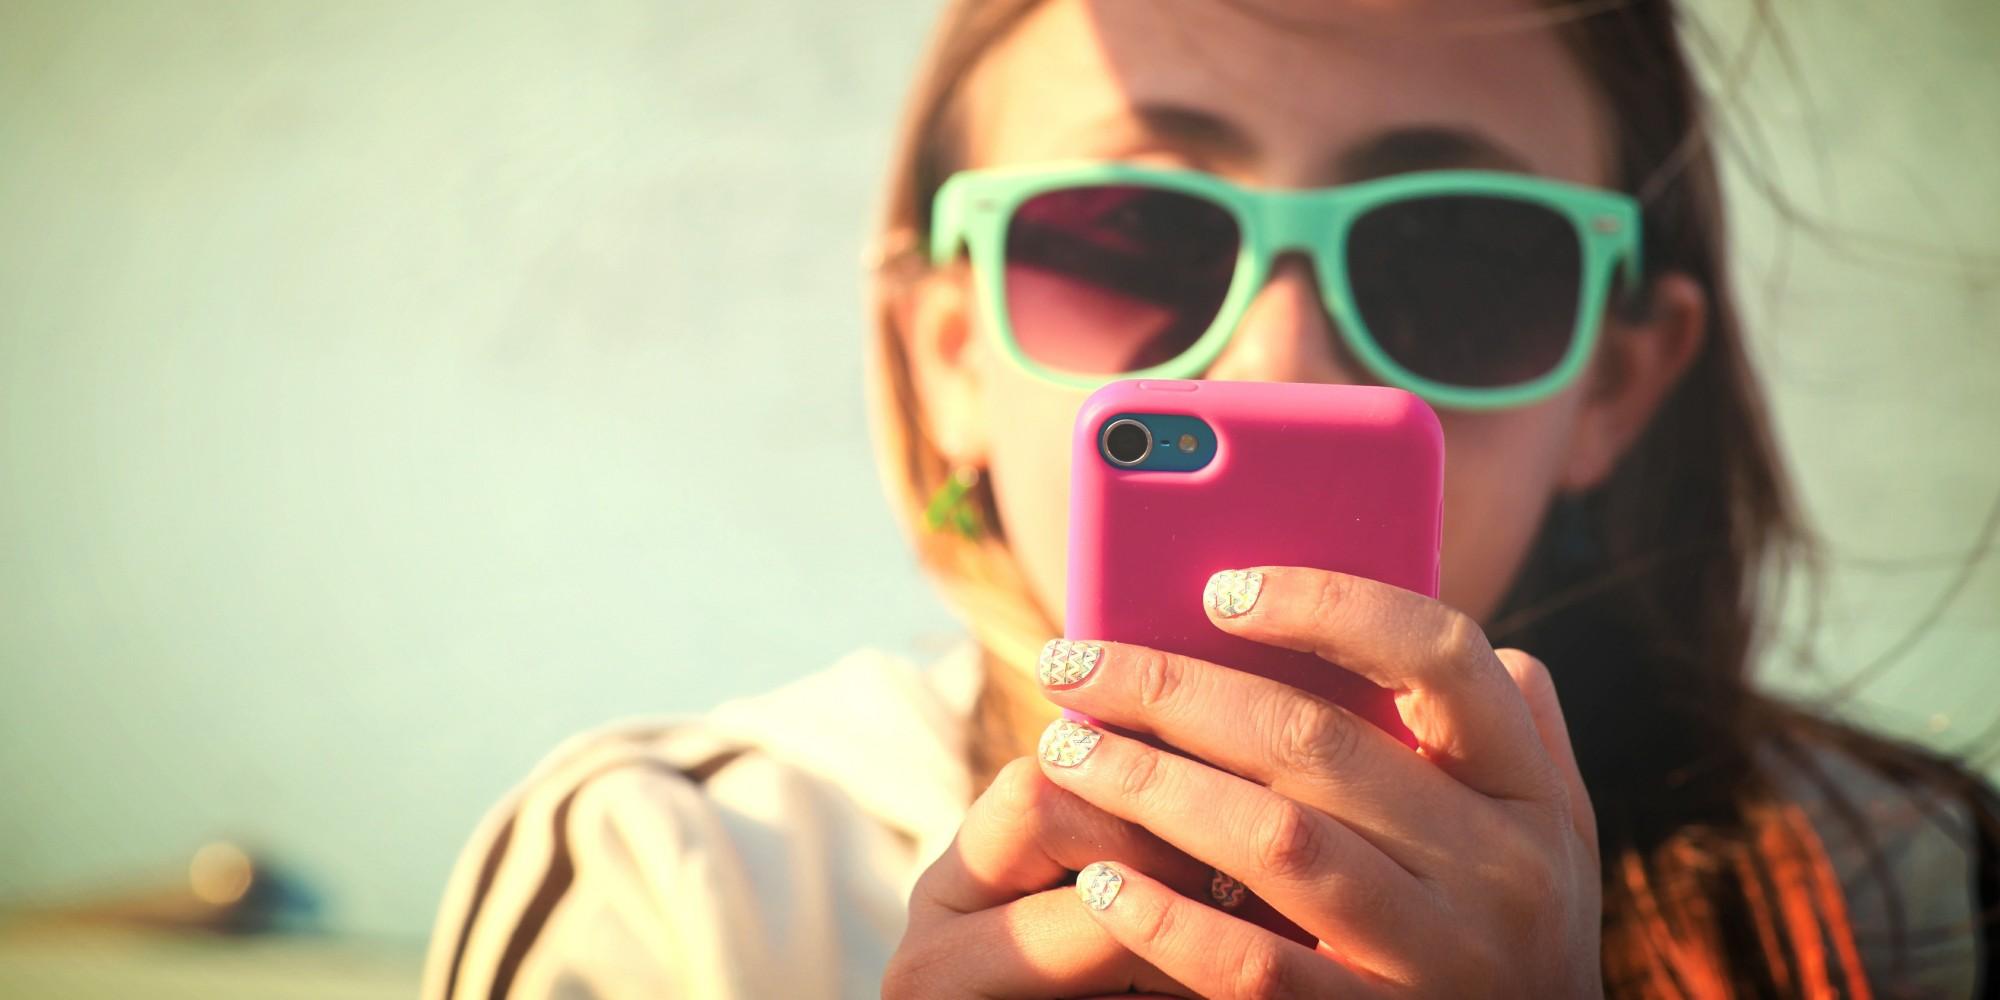 google, sprint, sms, texting, messaging, whatsapp, rcs